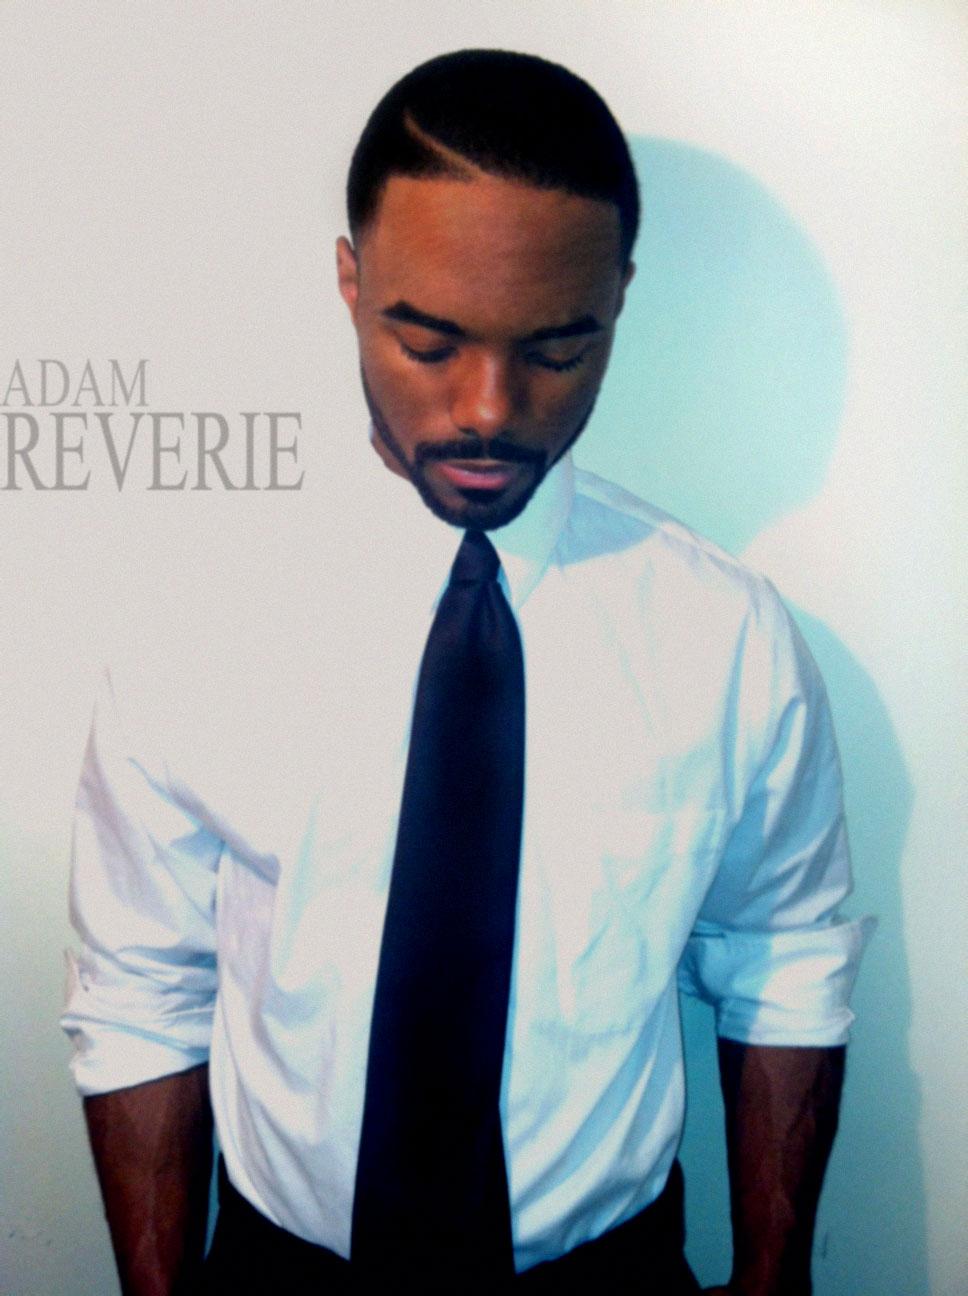 Adam Reverie – Well Do Dat